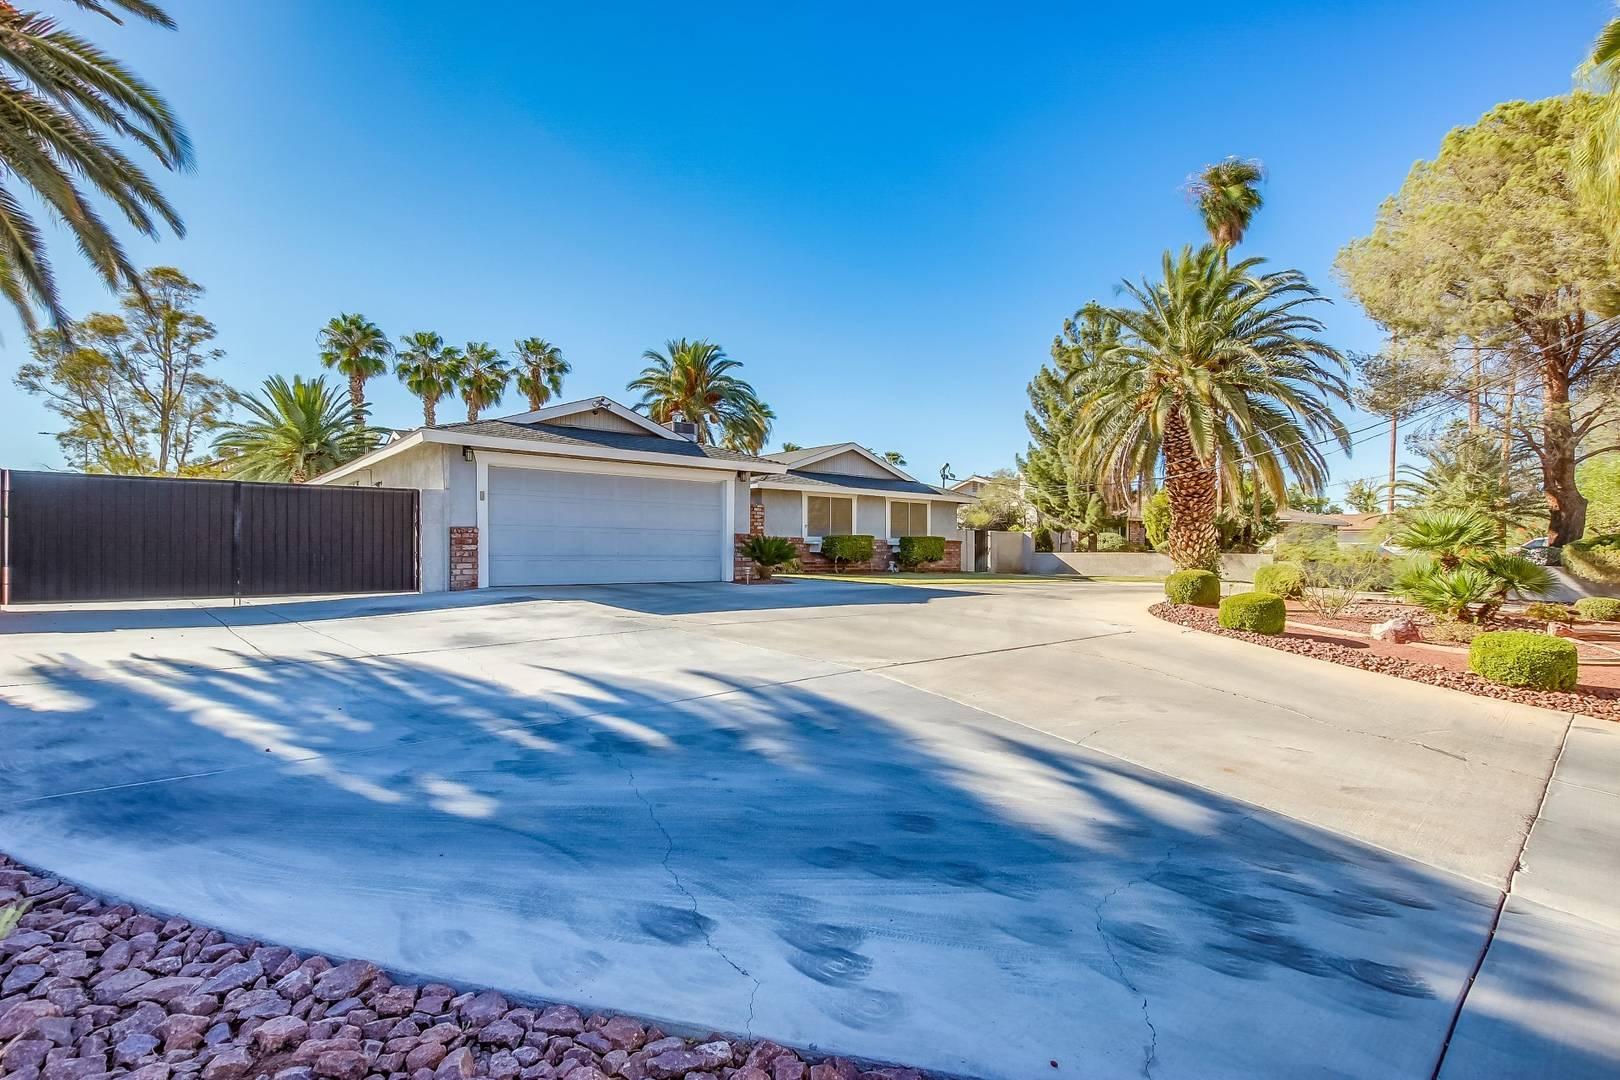 1643 Hinson St Las Vegas, NV 89102